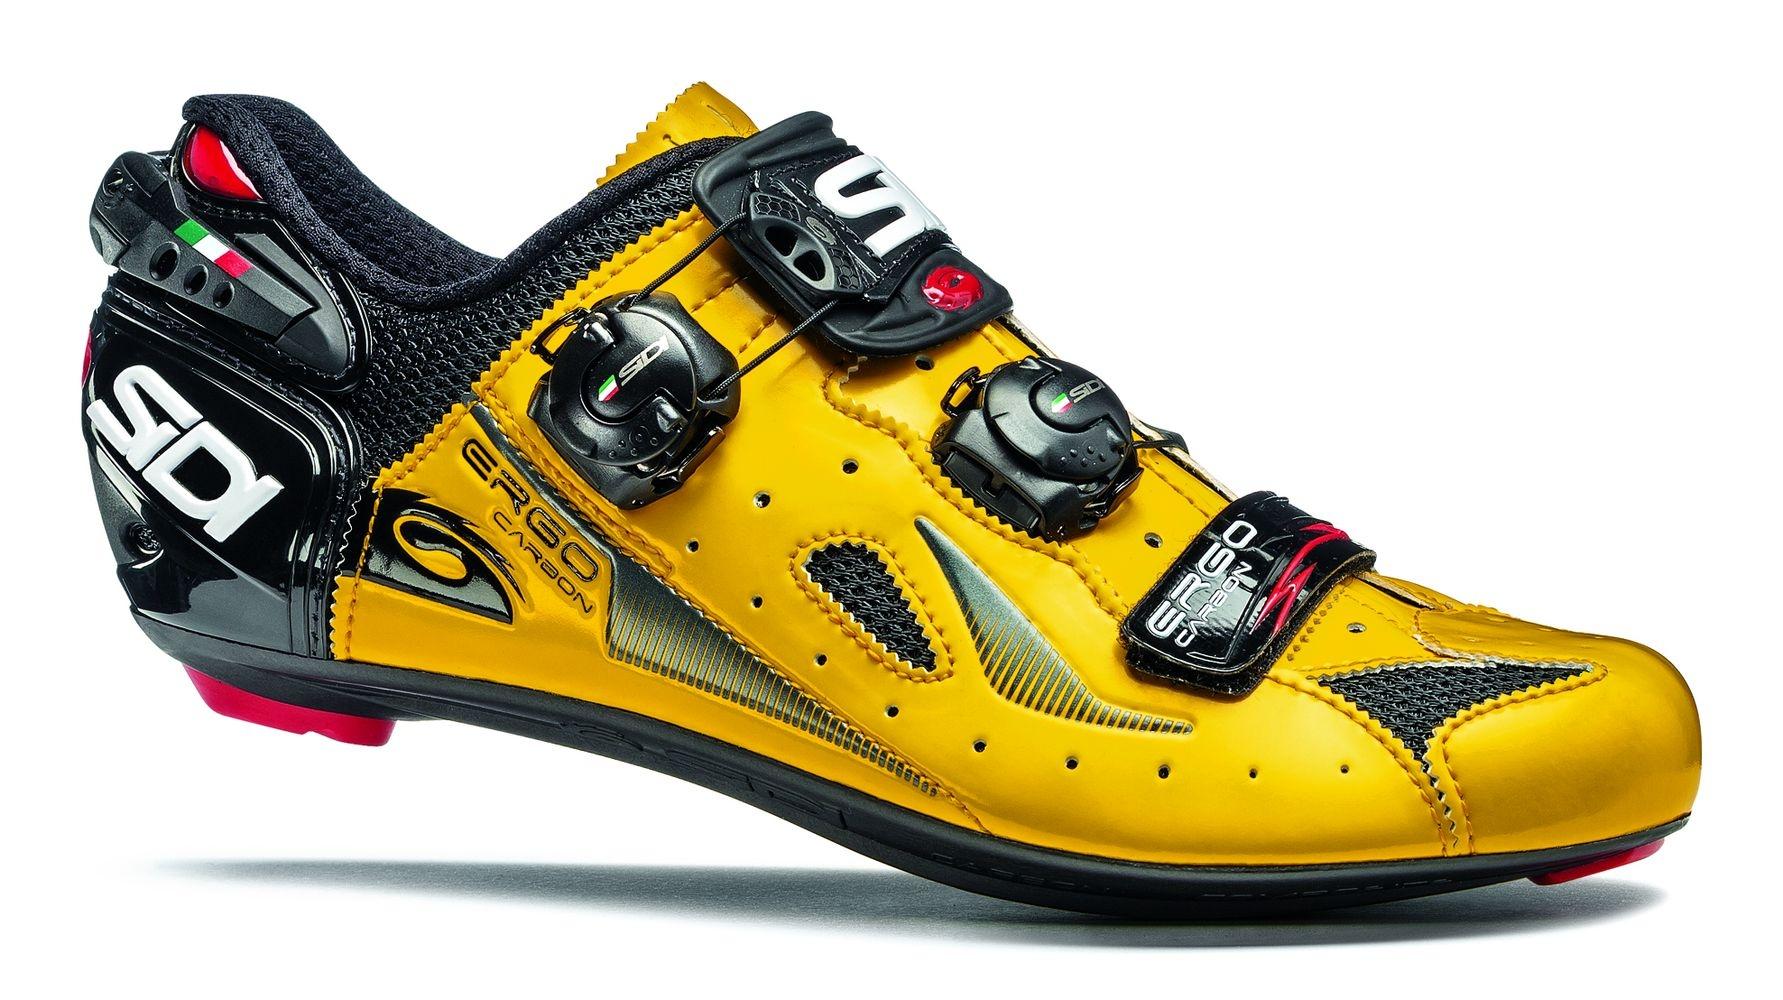 Chaussures Sidi ERGO 4 Carbon Composite Jaune/Noir - 42